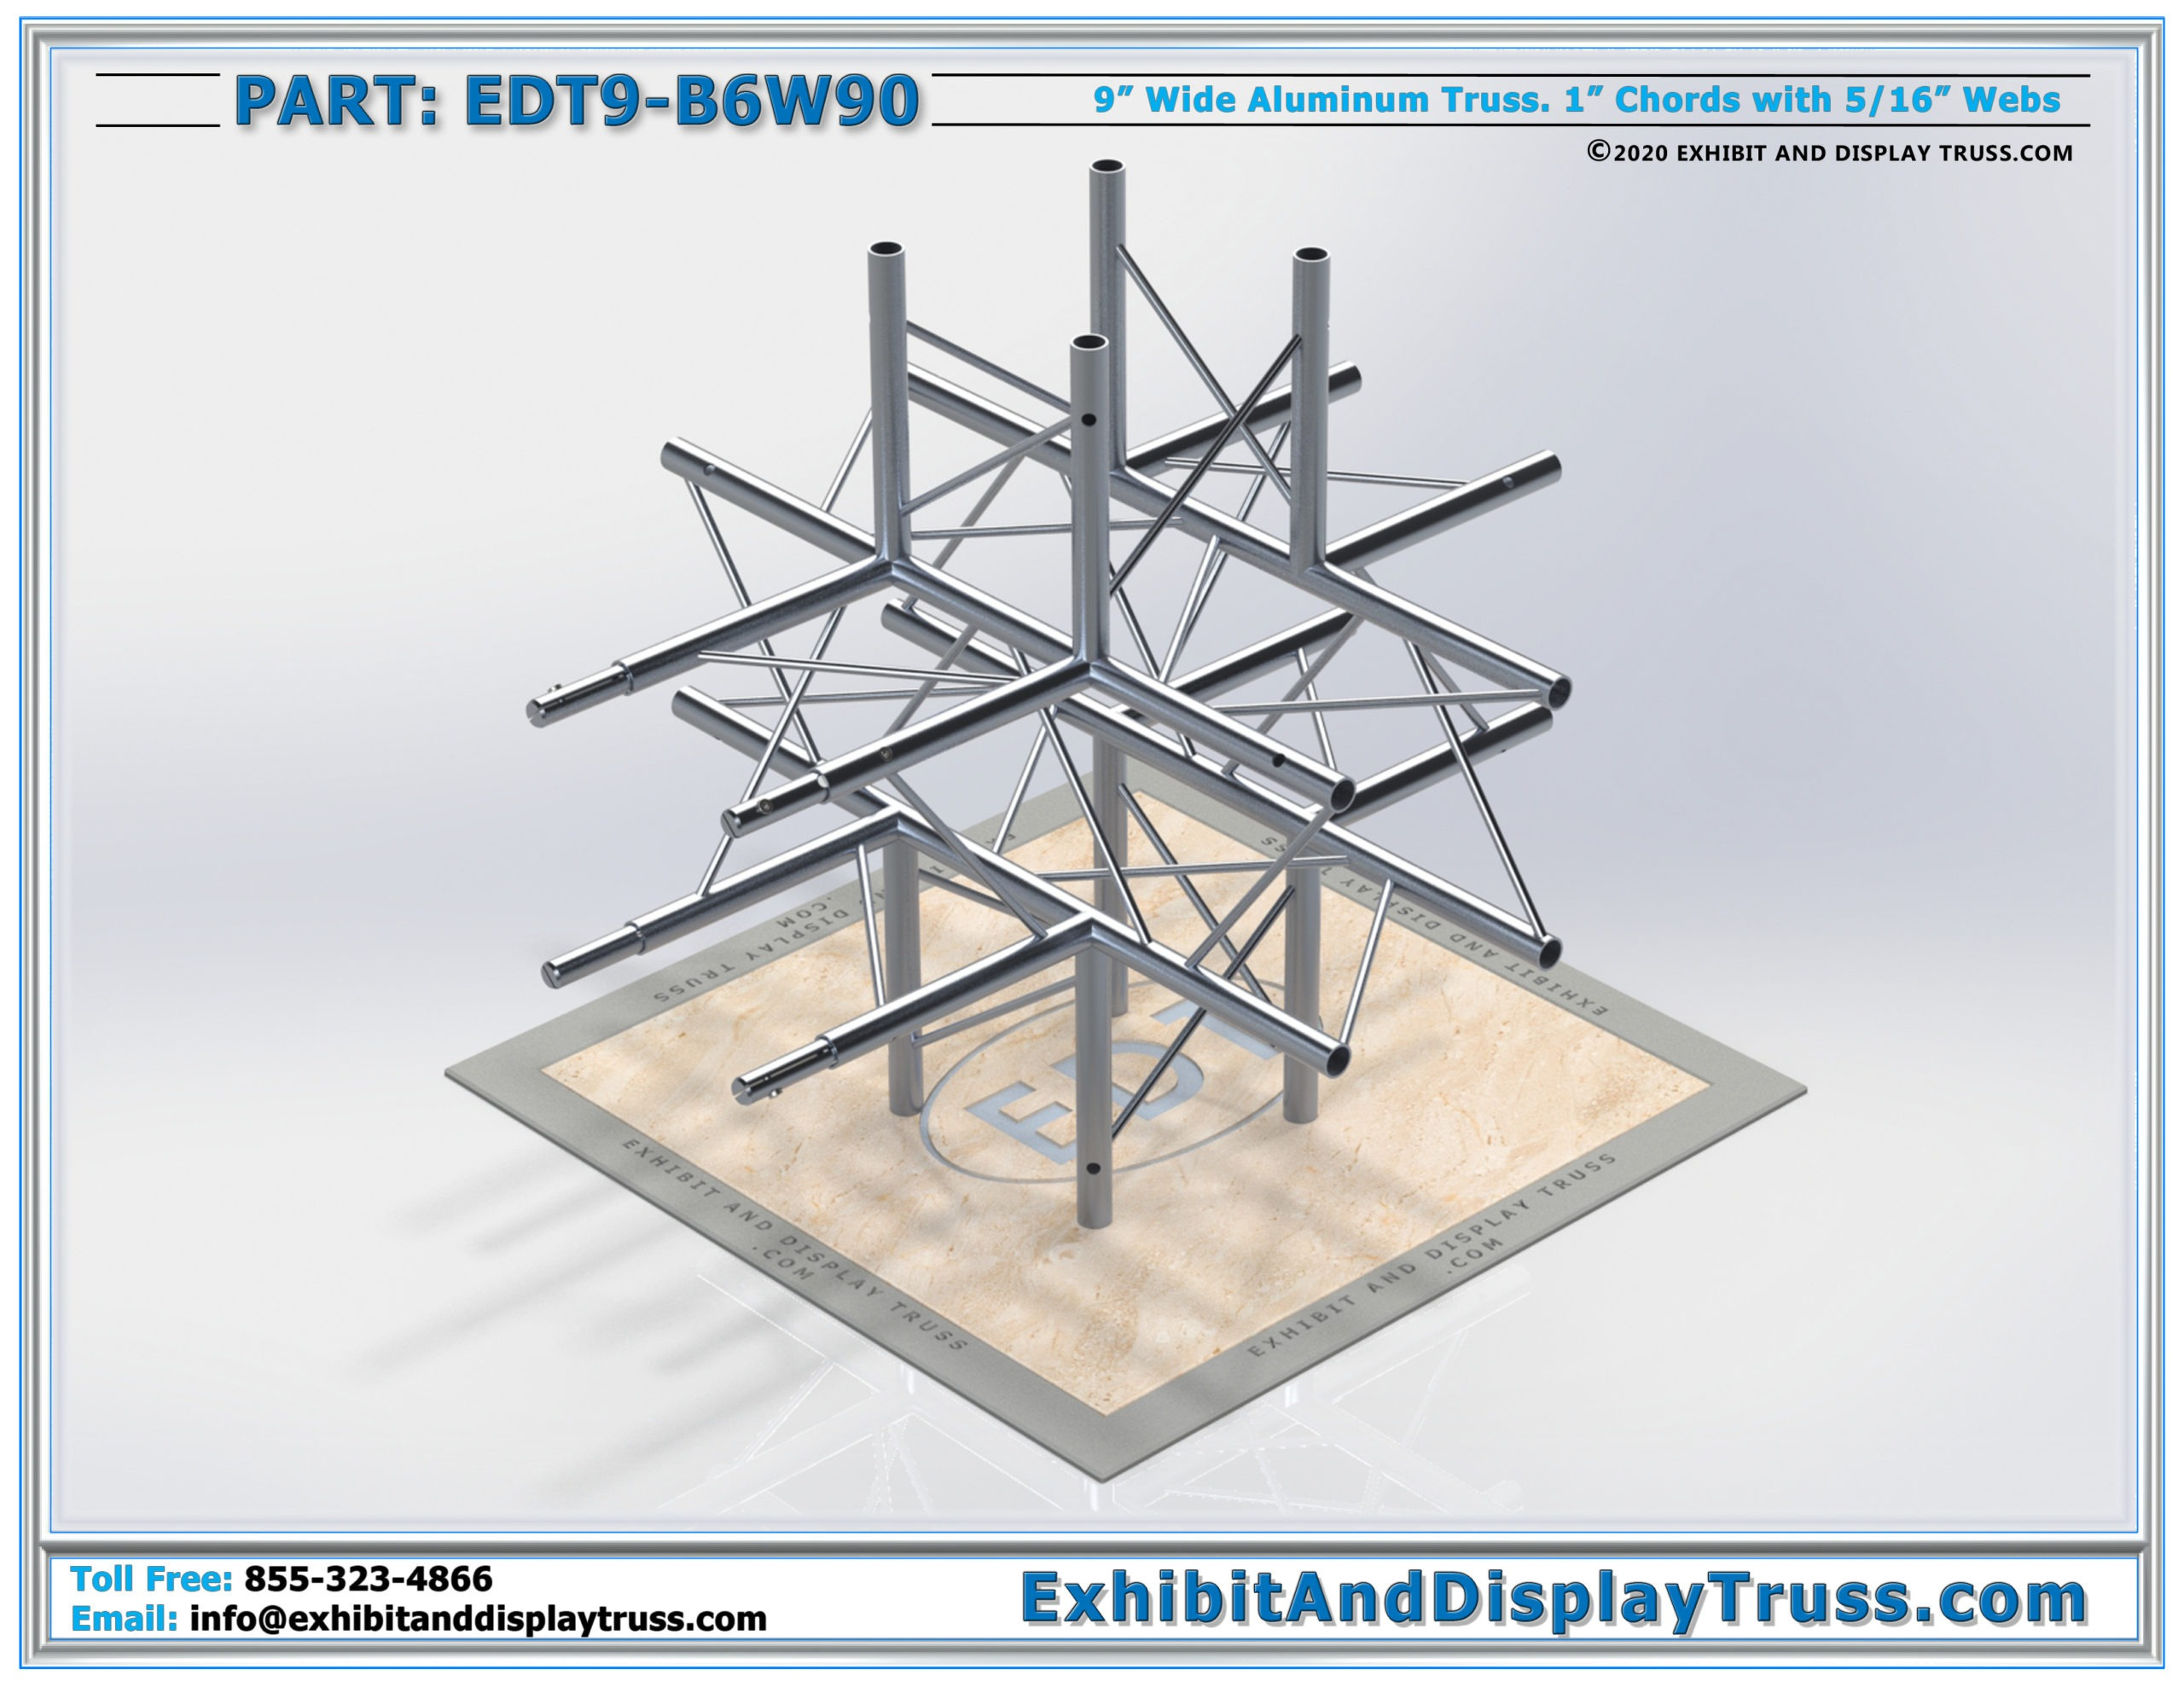 EDT9-B6W90 / 6 Way 90° Box Junction